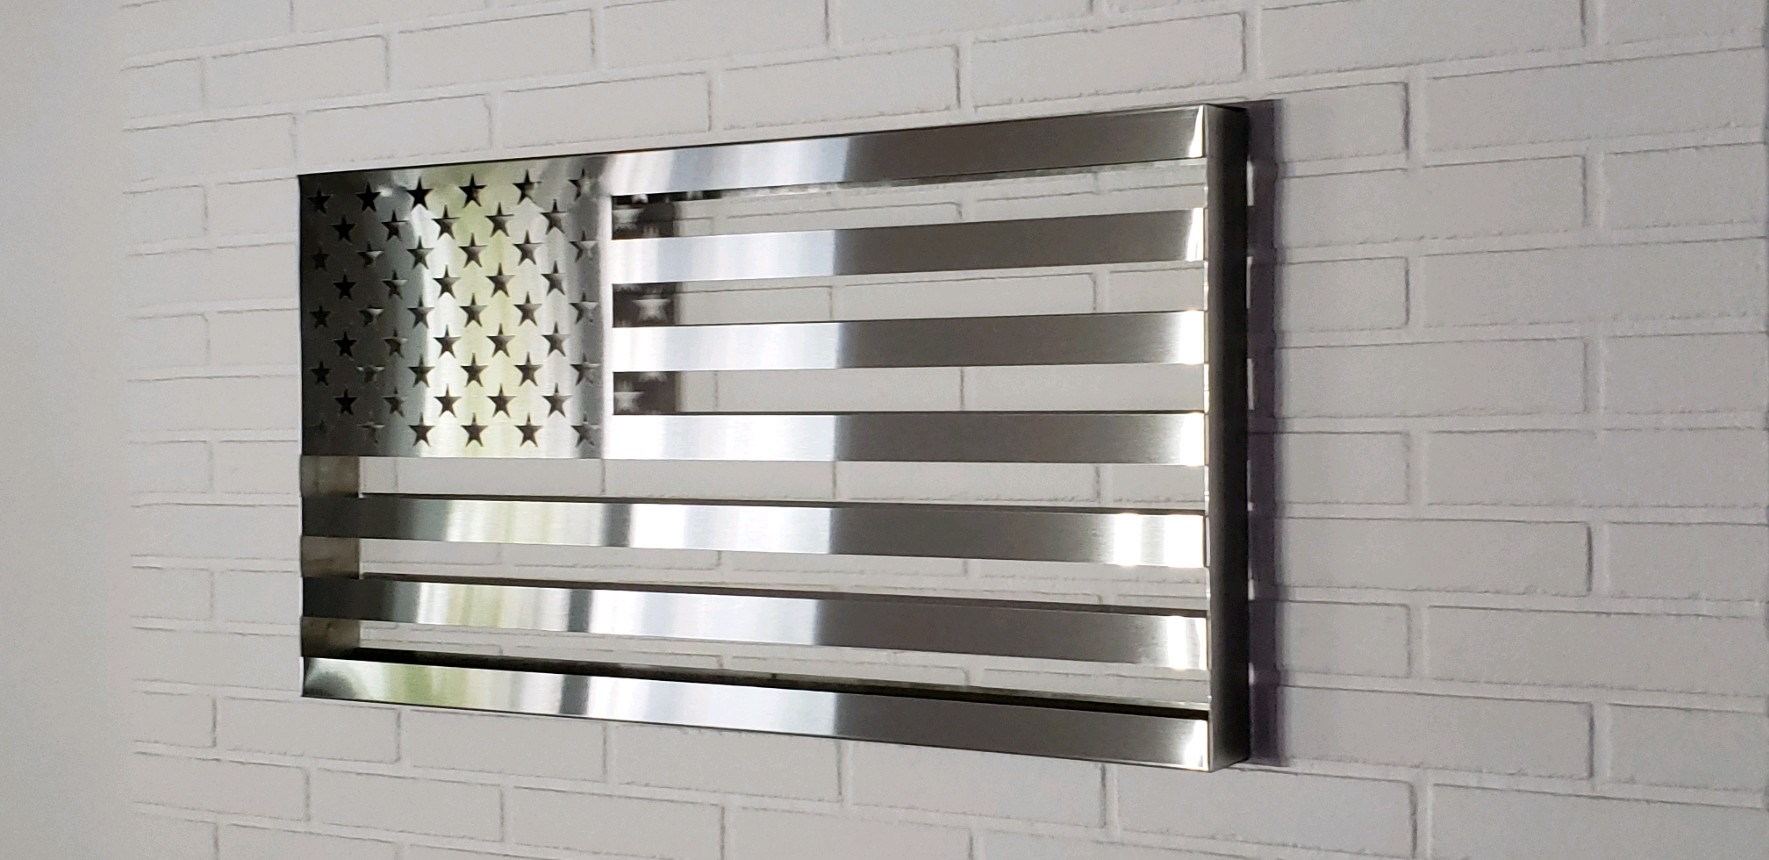 29 wall flag.JPG